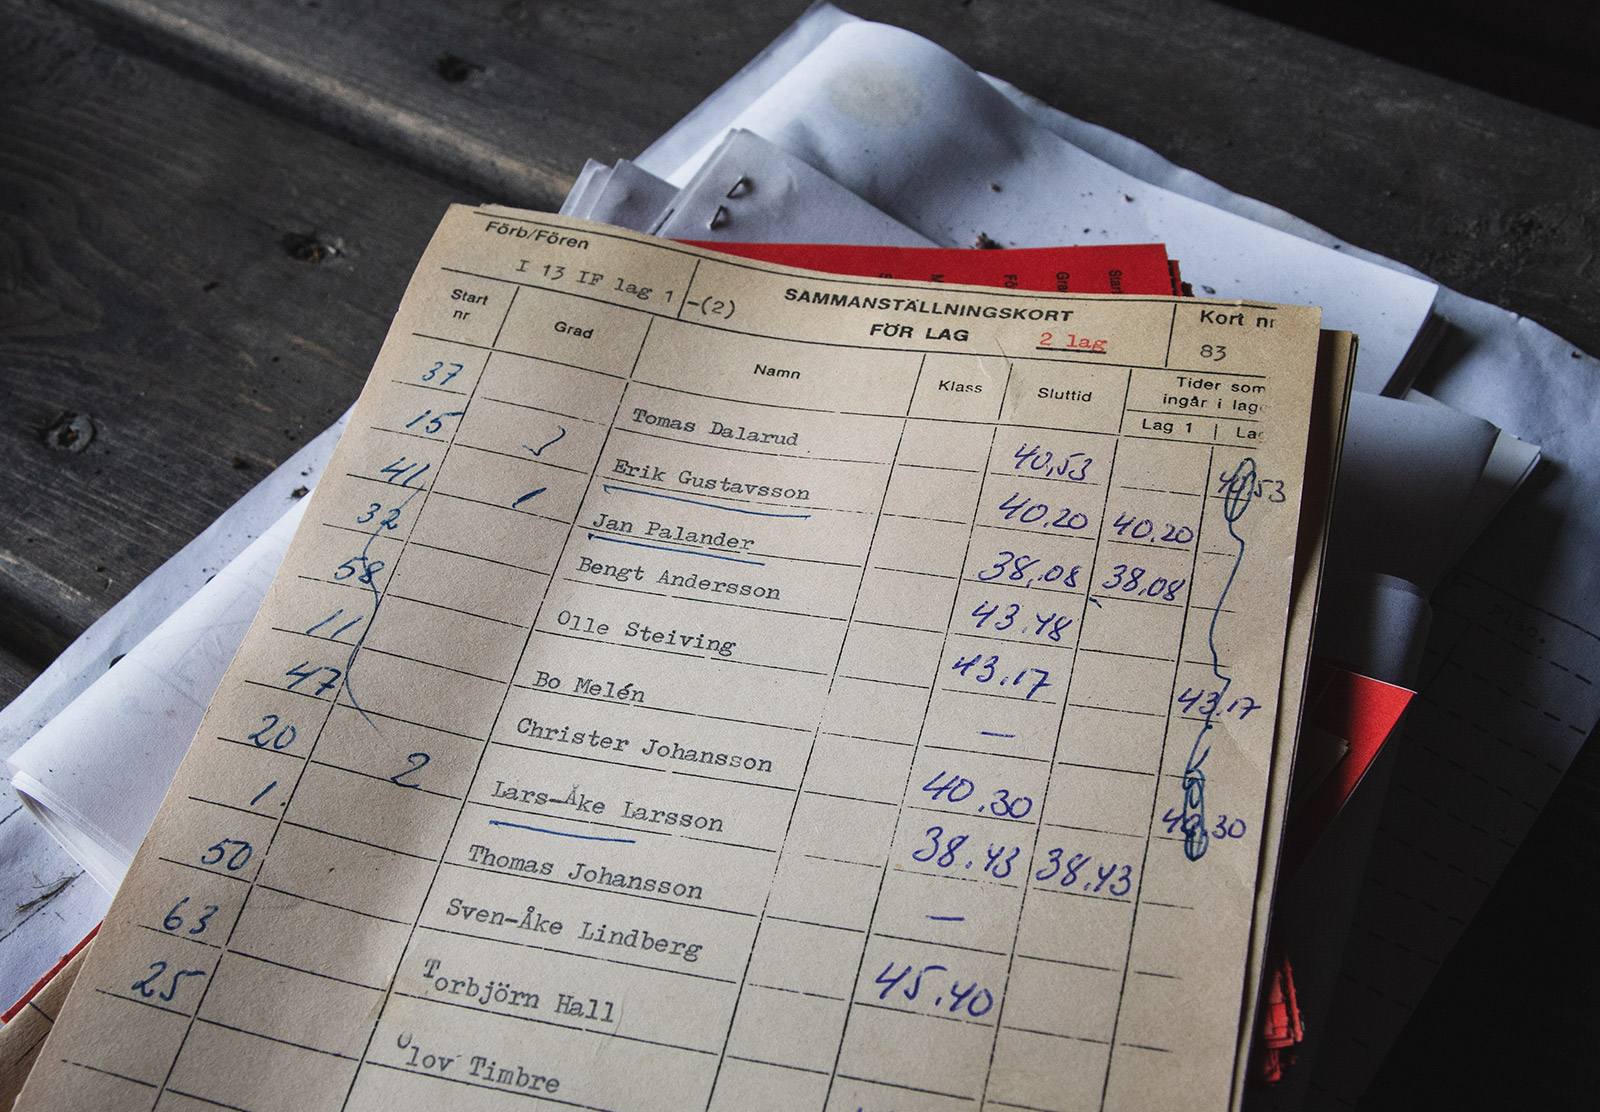 Old scorecards